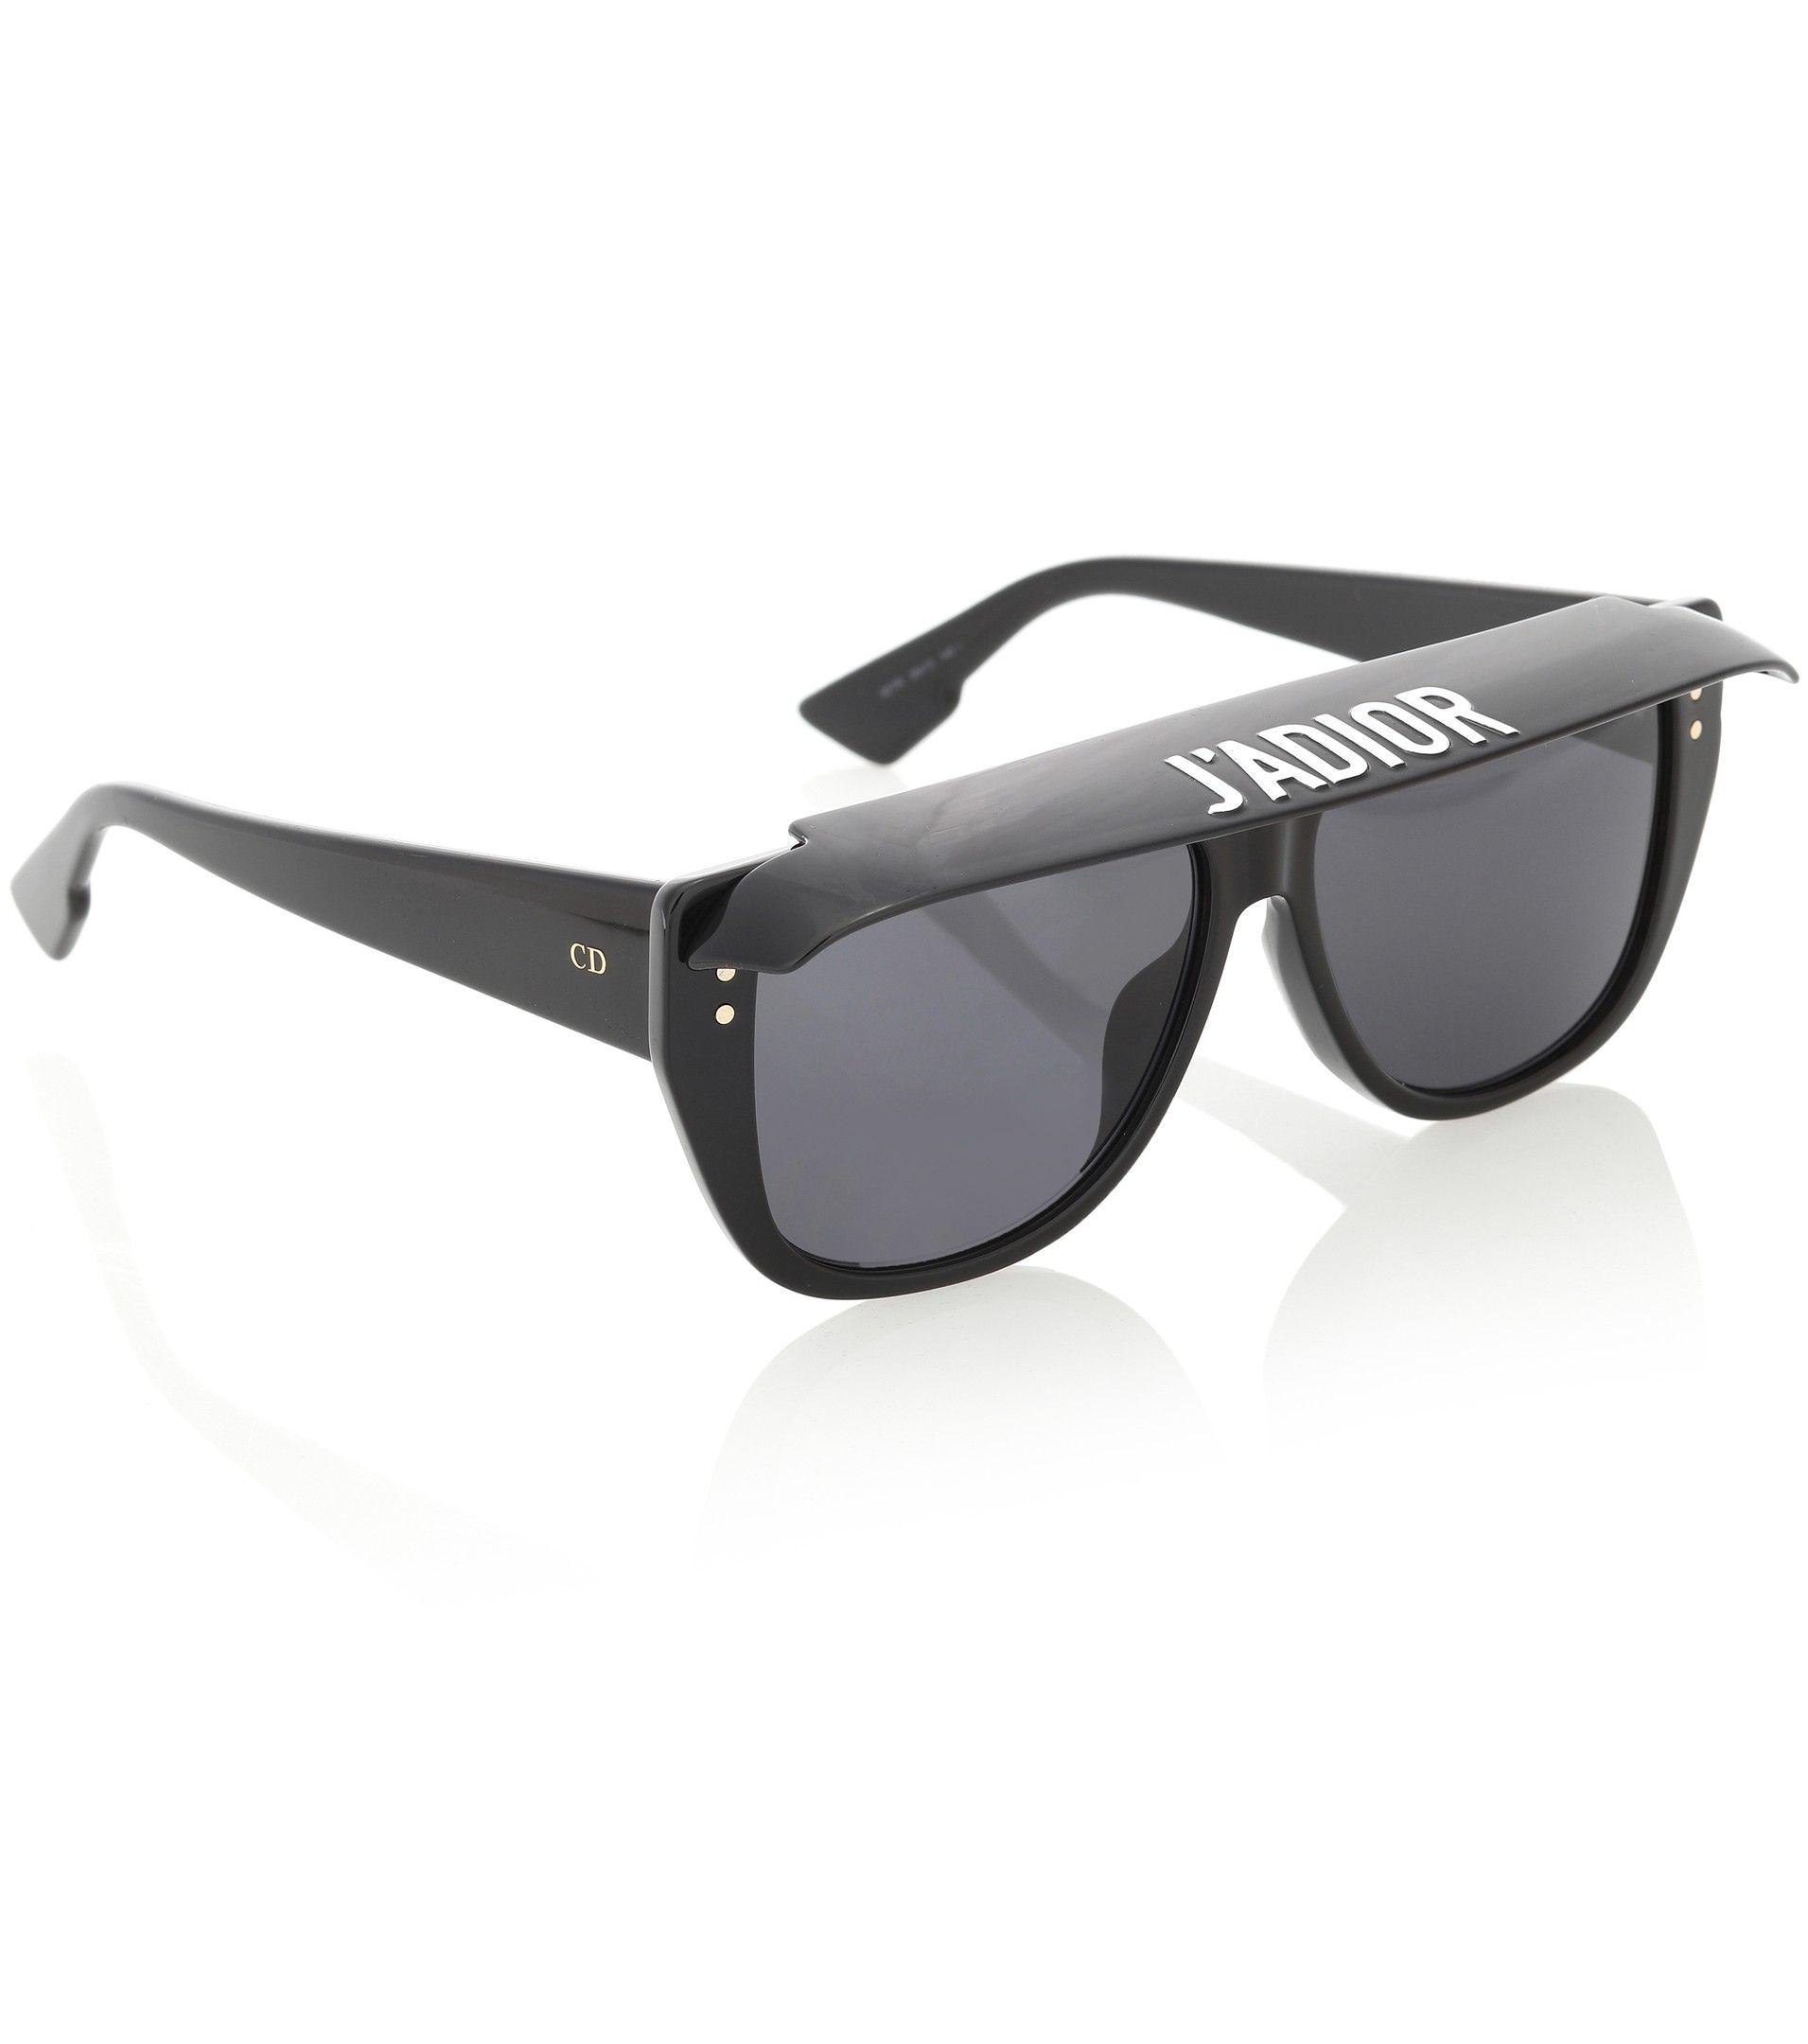 b9e8c19e1ce Dior Sunglasses - J ADIOR visor sunglasses